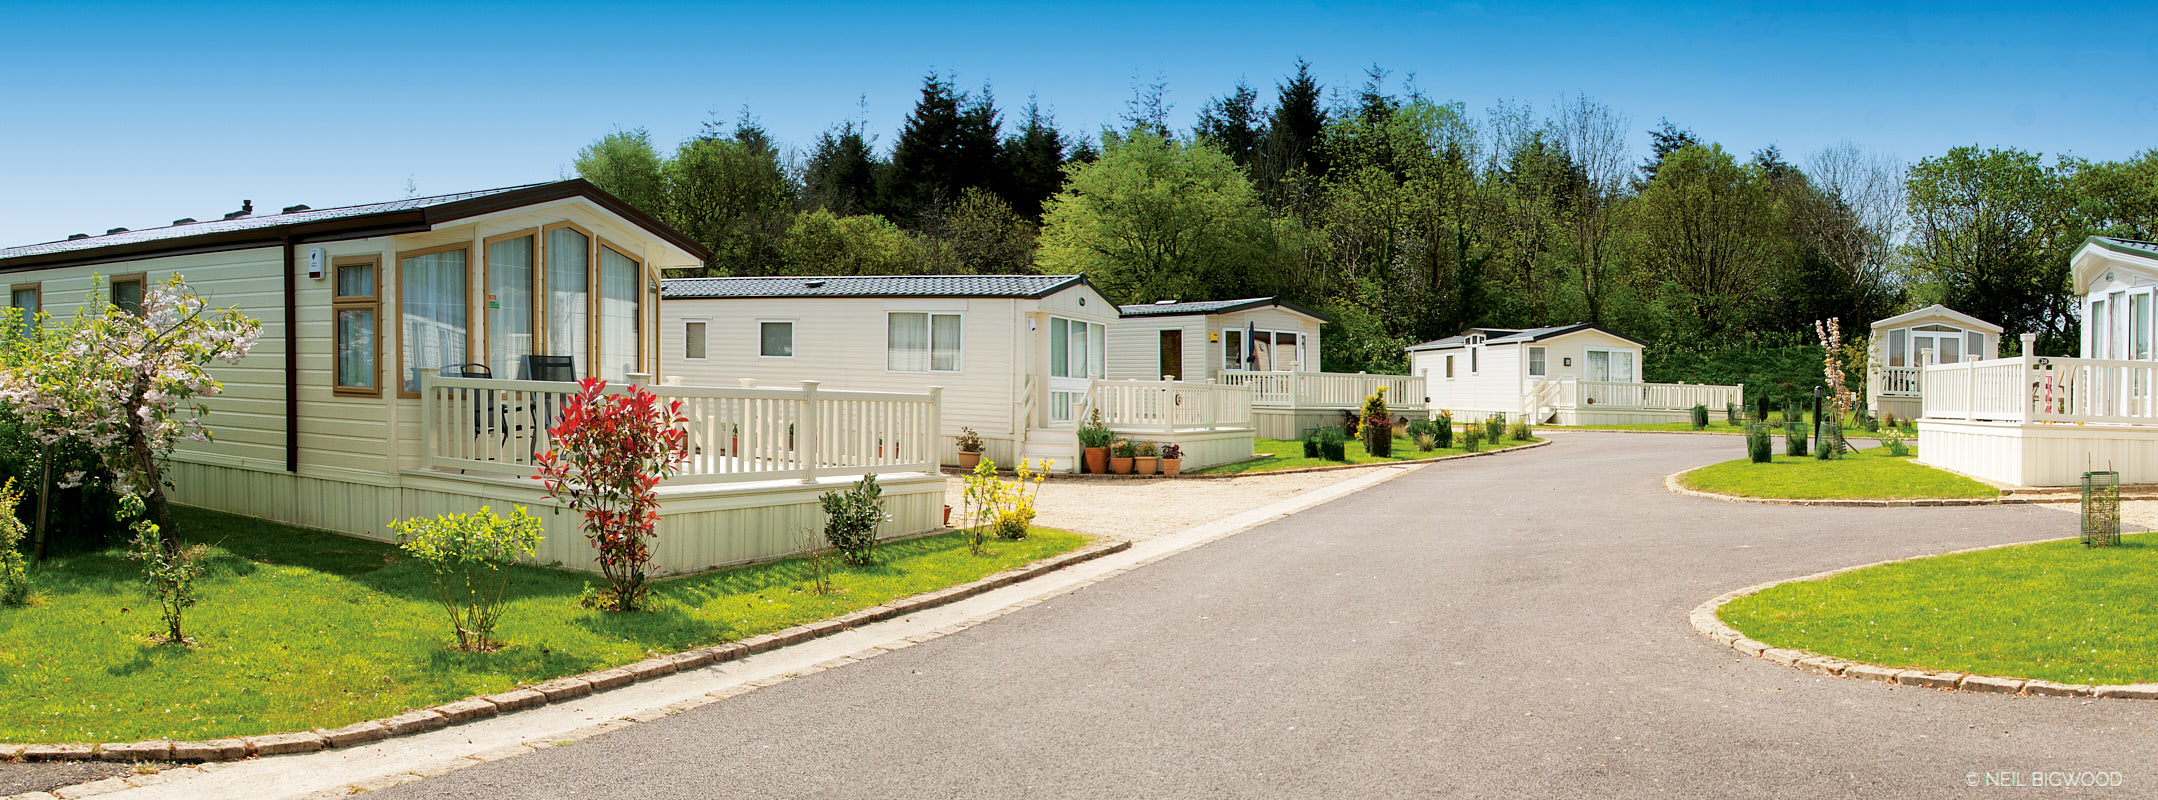 Neil-Bigwood-Monkton-Wyld-Holiday-Homes-72